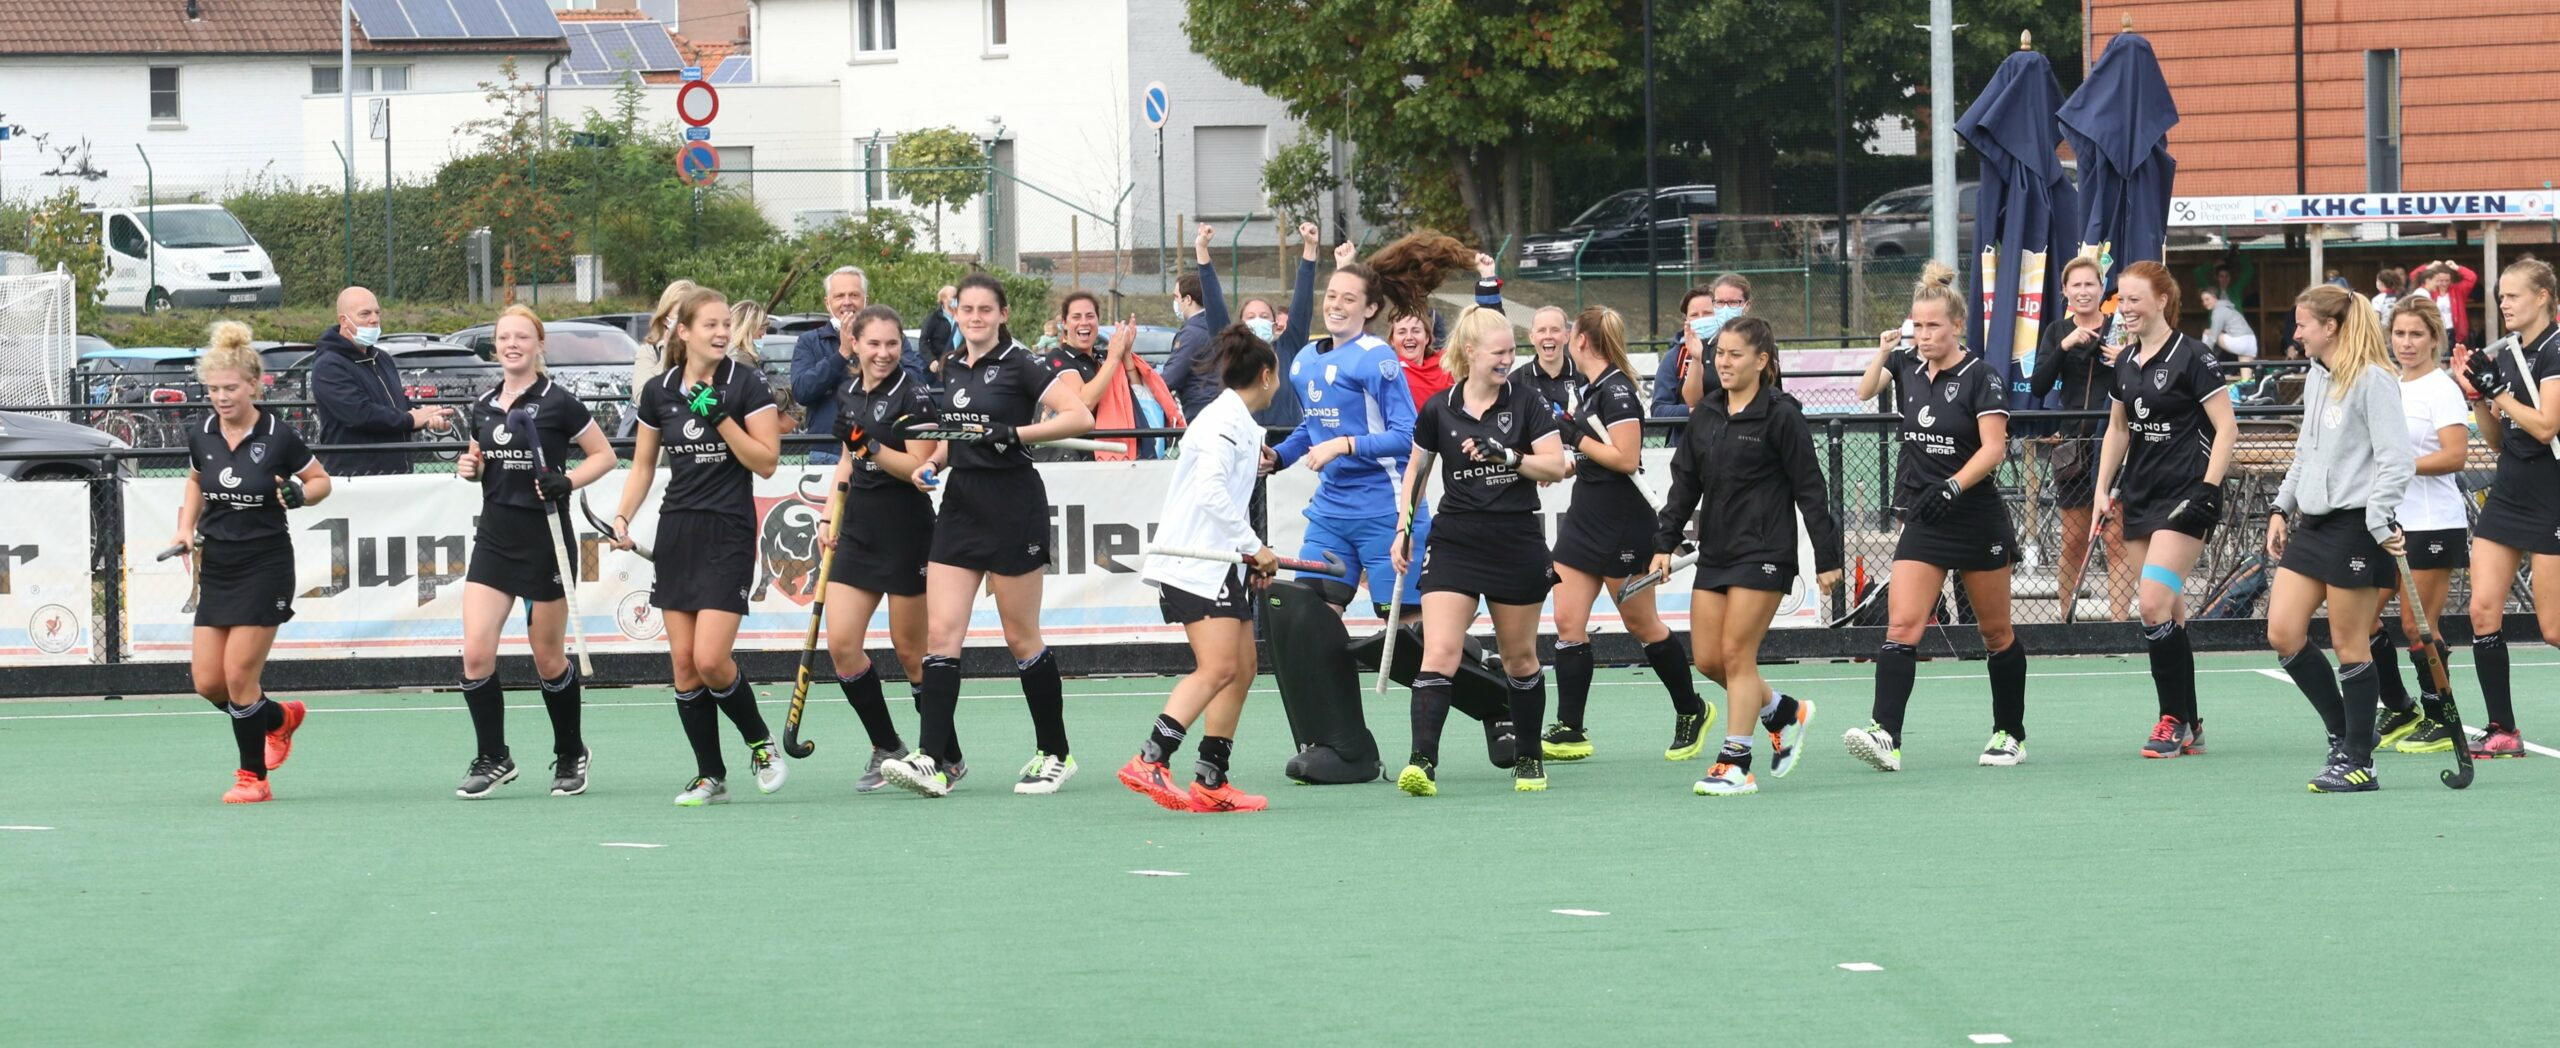 Leuvense hockeyvrouwen grijpen naast eerste punt, Victory uitgekookter